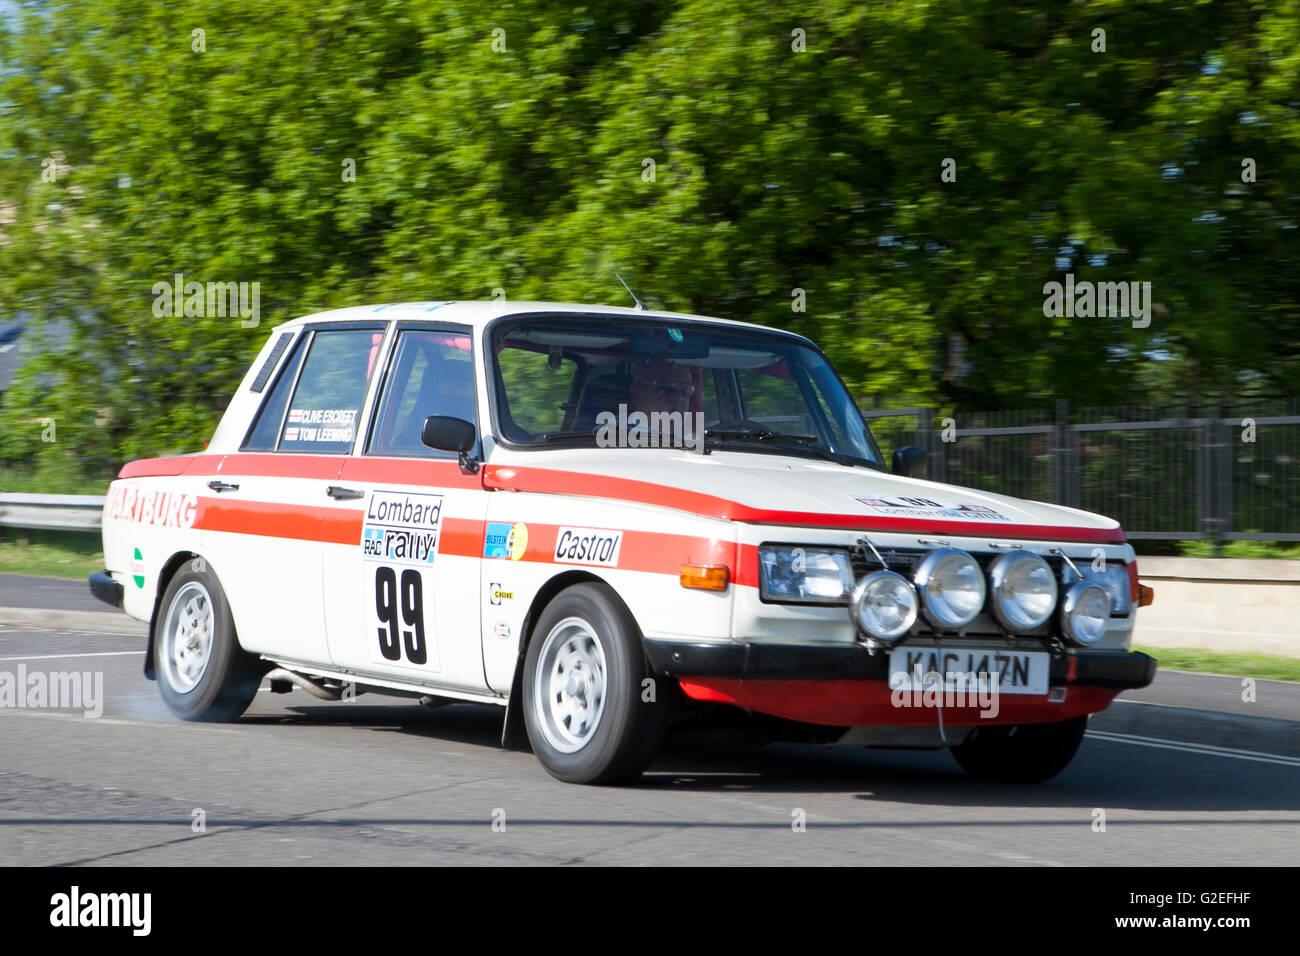 Skoda, classic, rally, sports, car, Pendle, Lancashire, UK. 29th May ...